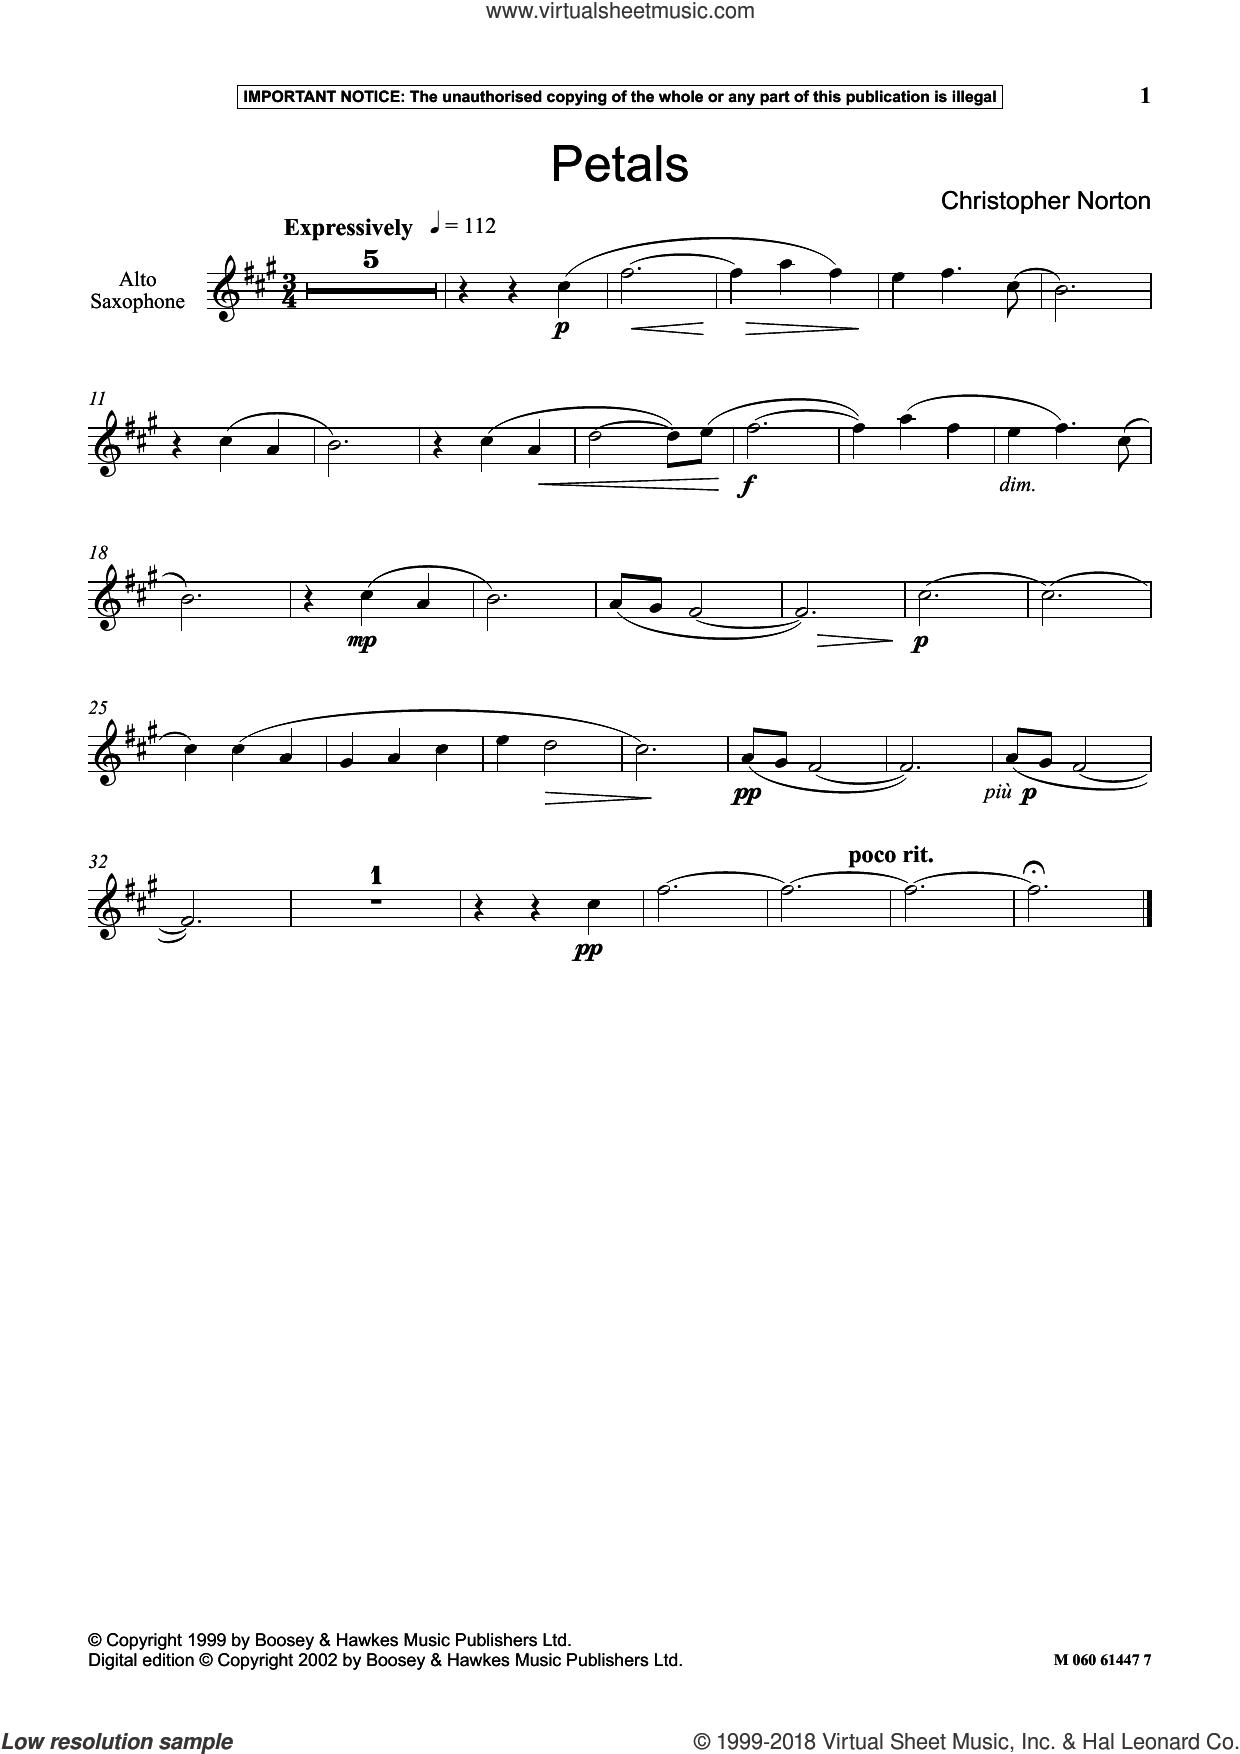 Petals sheet music for alto saxophone solo by Christopher Norton, classical score, intermediate skill level